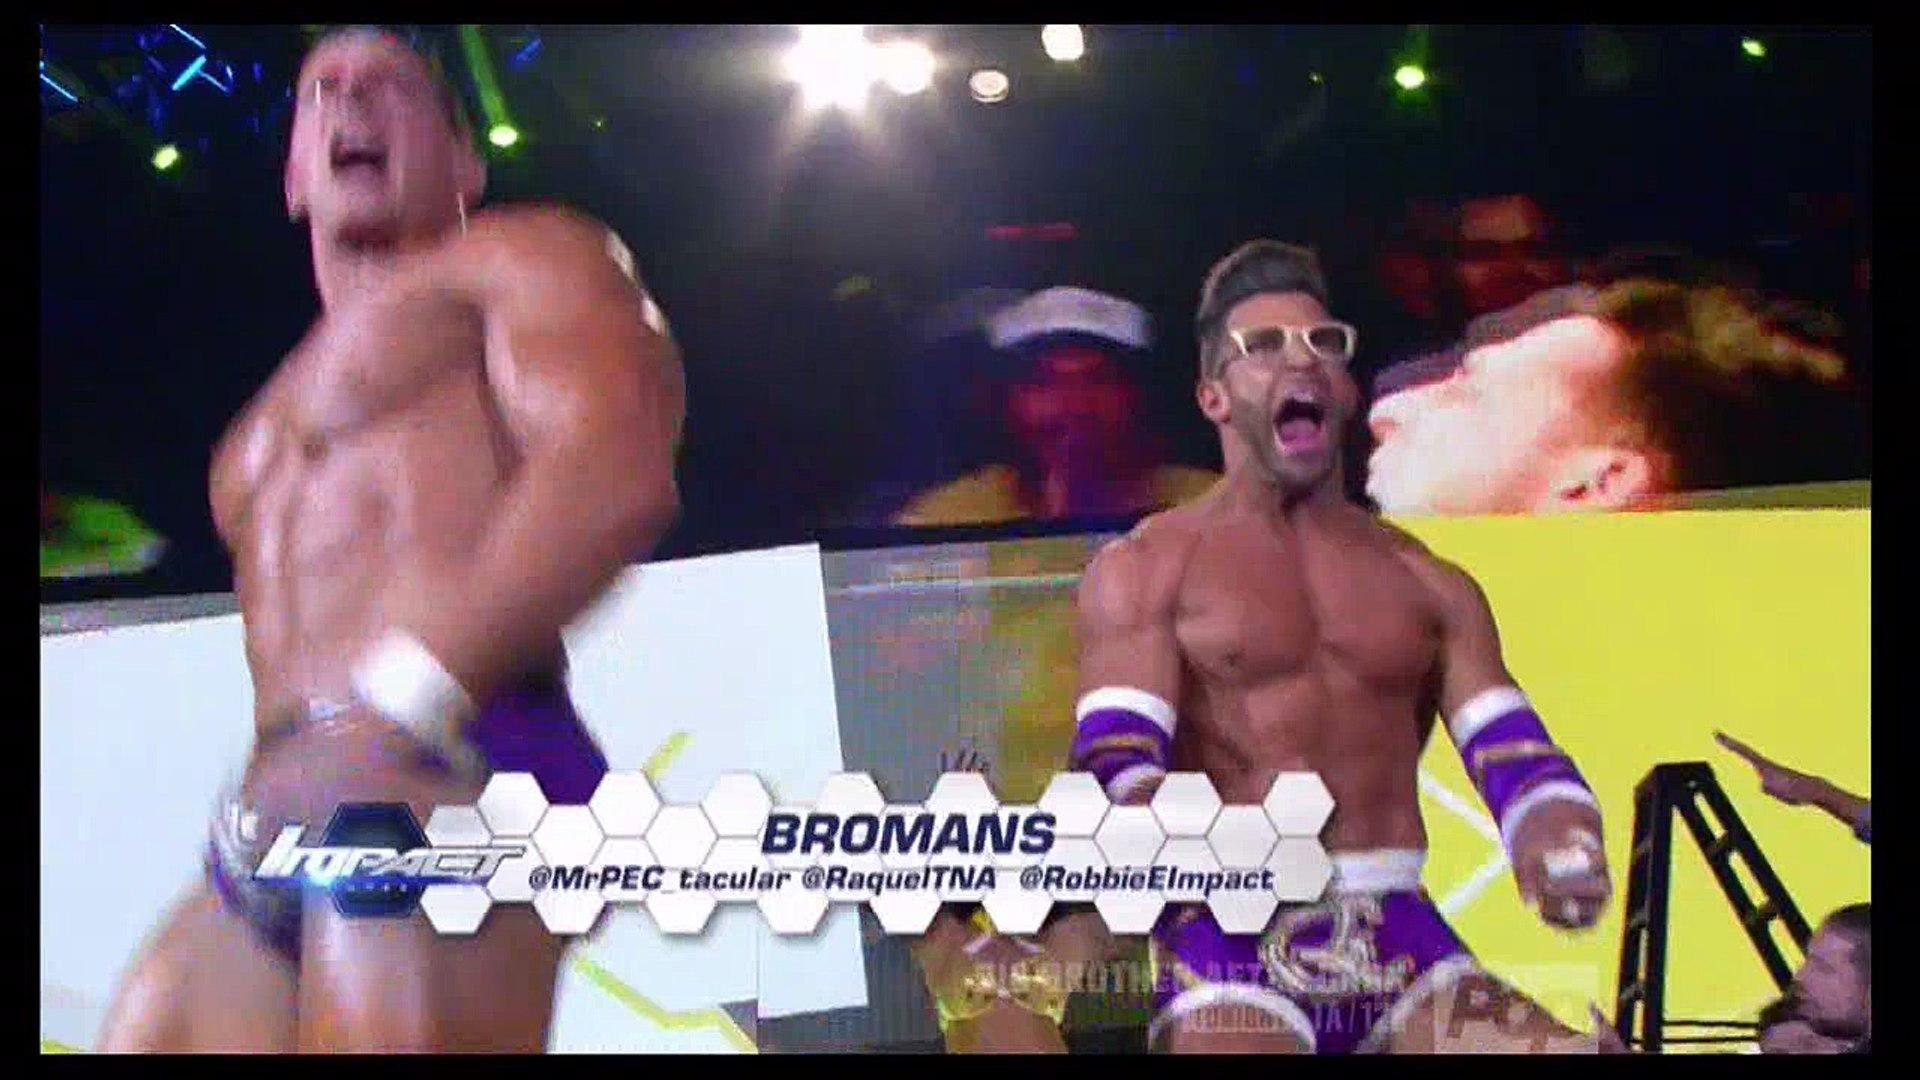 The Broken Hardys vs. The BroMans (w/ Raquel) vs. The Helms Dynasty vs. The Tribunal